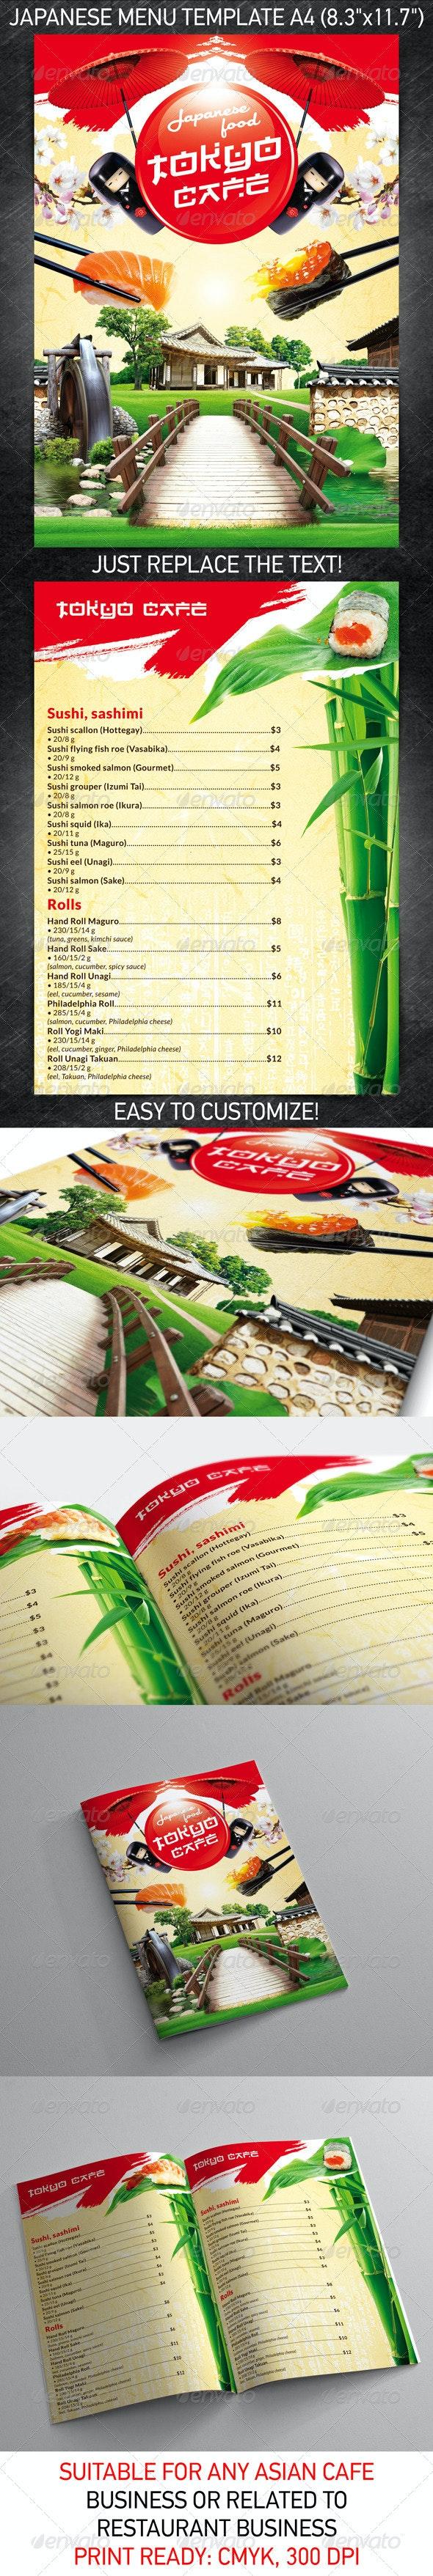 Japanese Menu Template - Food Menus Print Templates